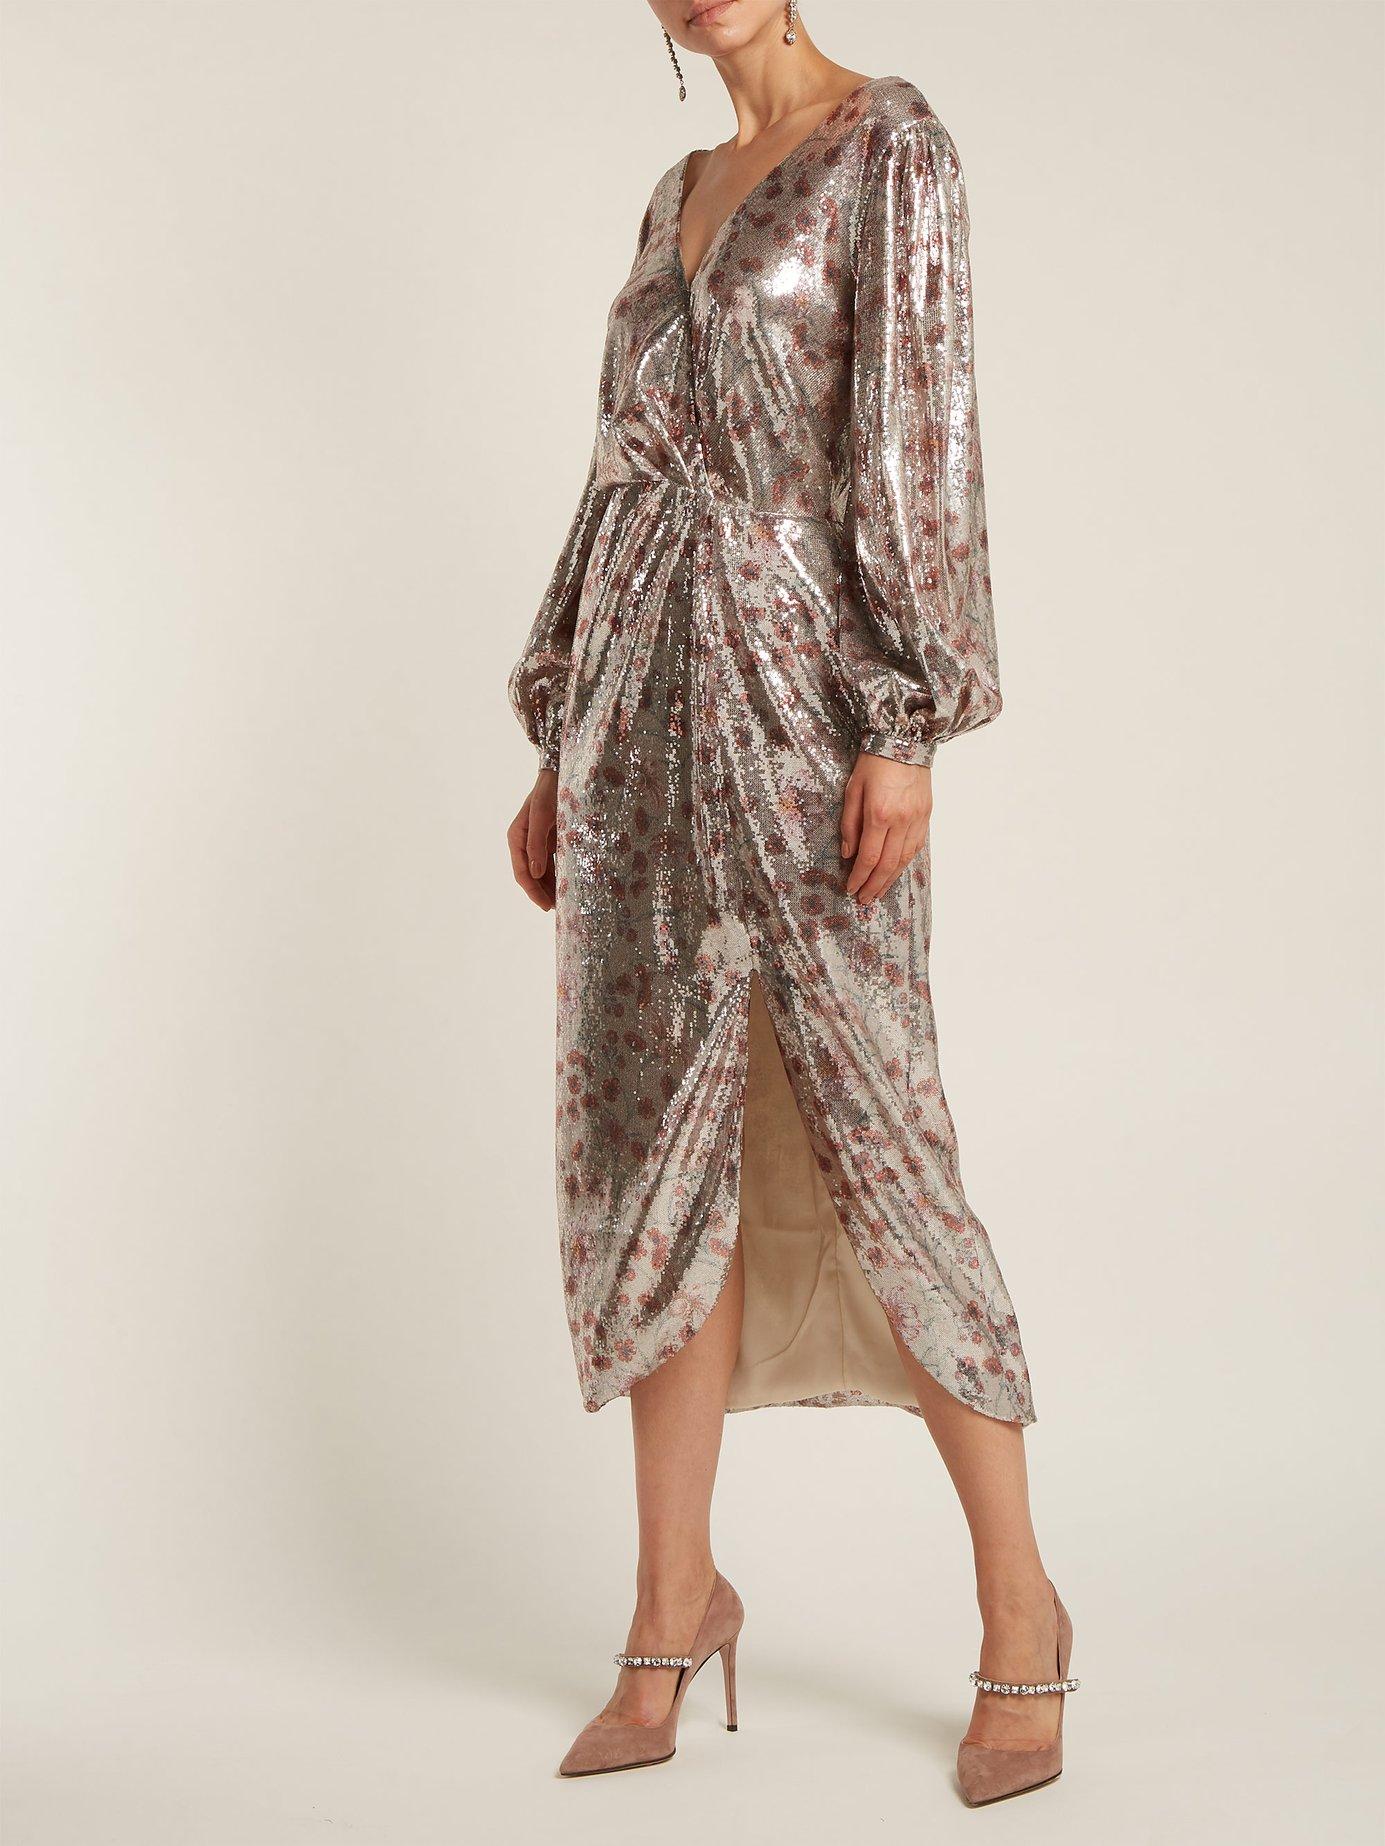 Alfonsina Storni sequinned dress by Johanna Ortiz